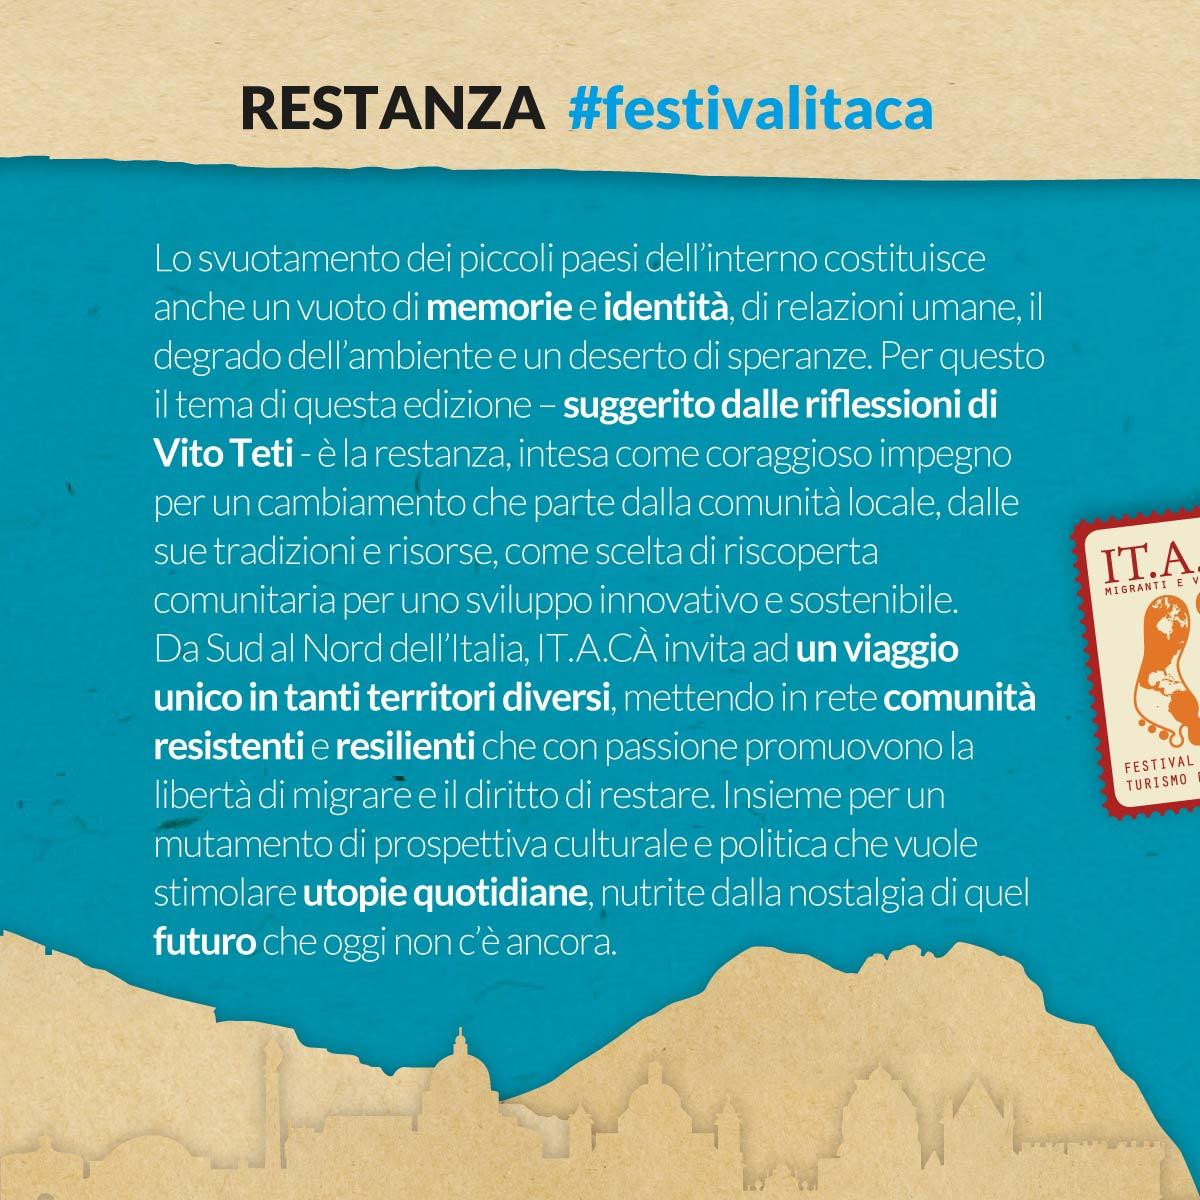 festival-itaca-strategia-eventi-turismo-sostenibile-branding-3